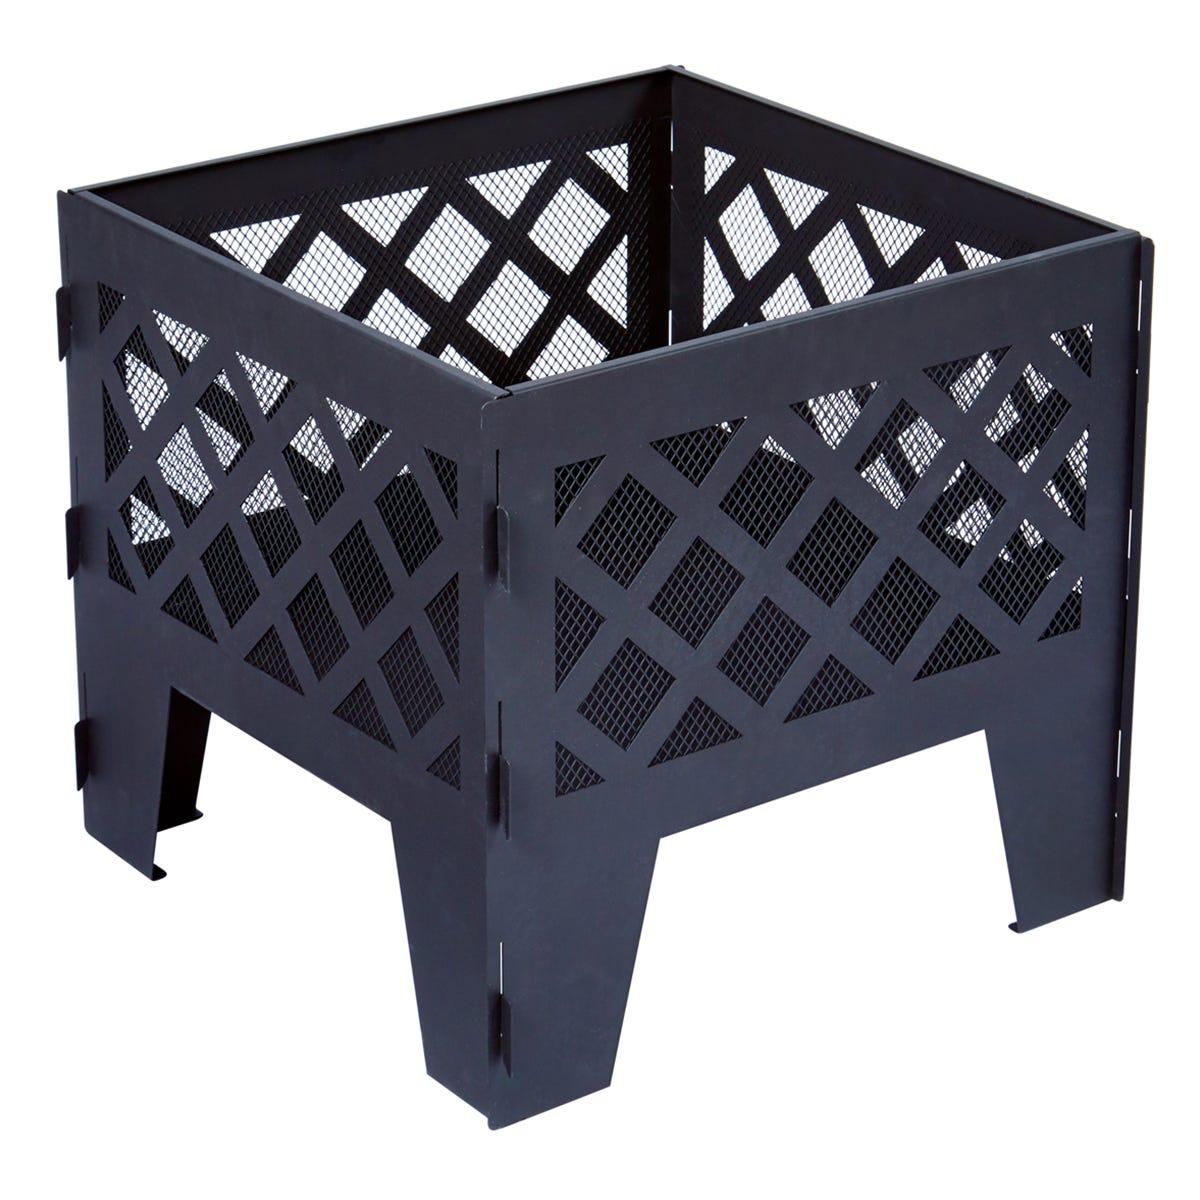 The Outdoor Living Company 50cm Square Black Metal Fire Pit / Basket / Brazier - H45 x W50 x D50cm